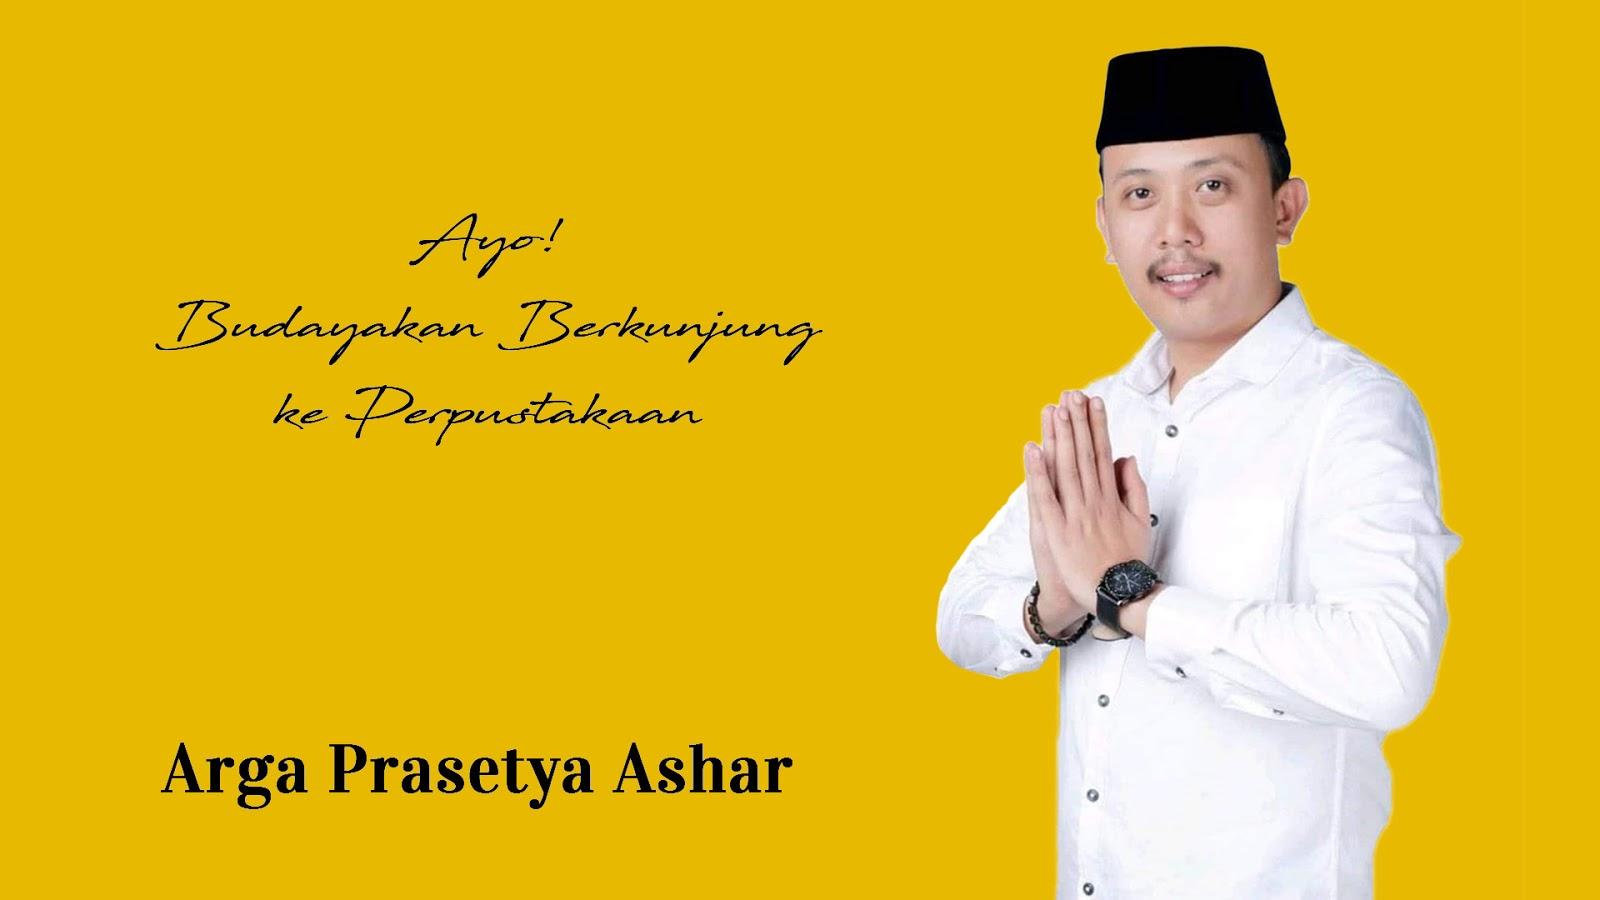 Arga Prasetya Ashar